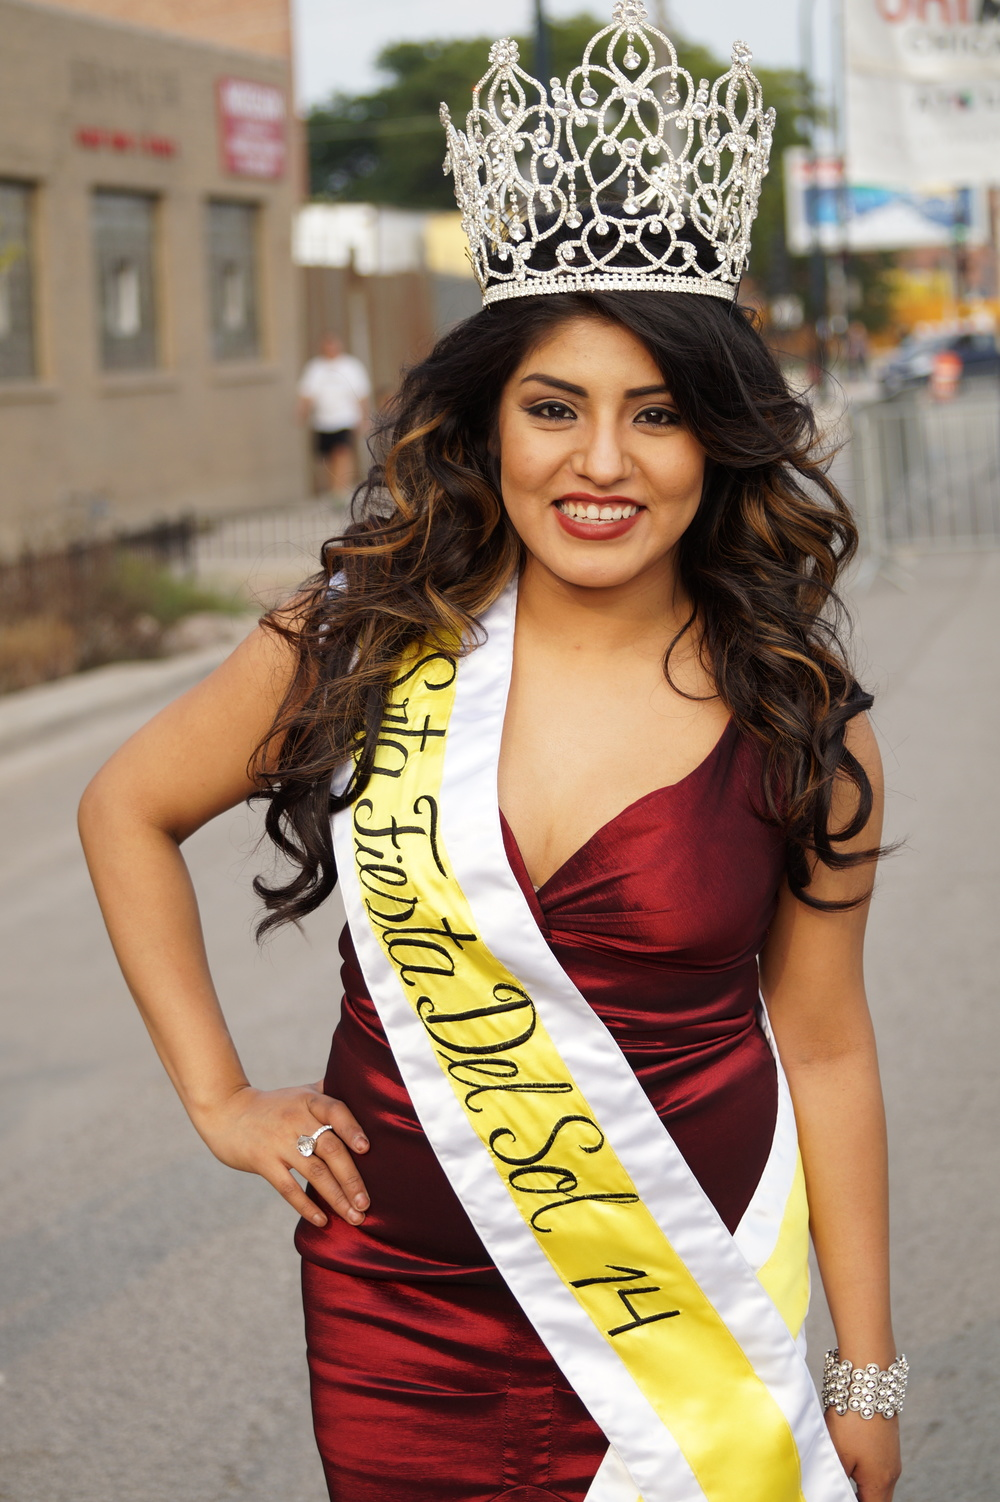 Srta. Fiesta del Sol 2014 Maria J. Herrera